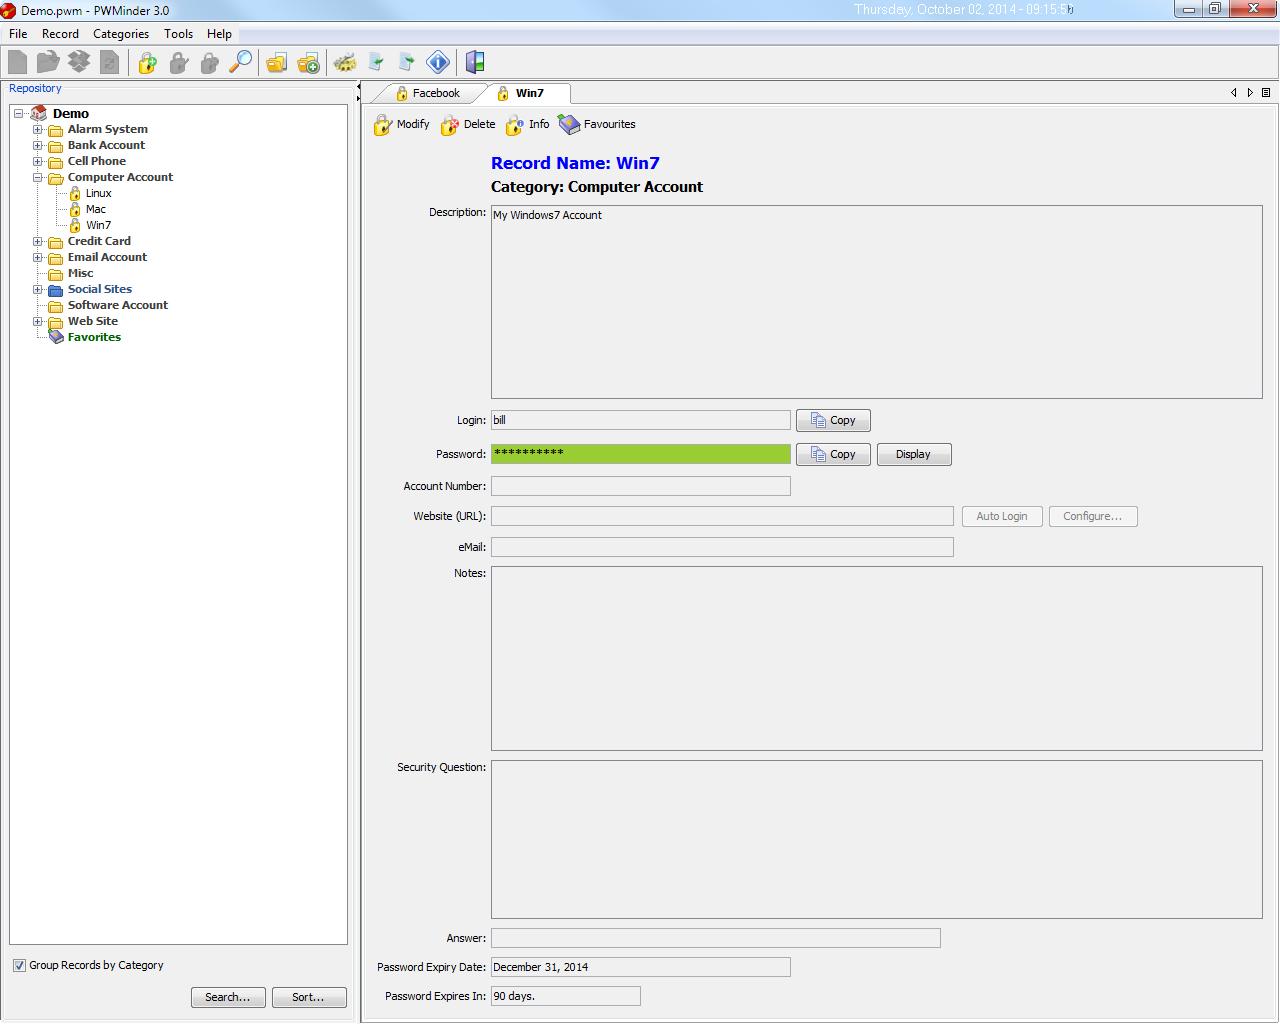 PWMinder Desktop Screenshot